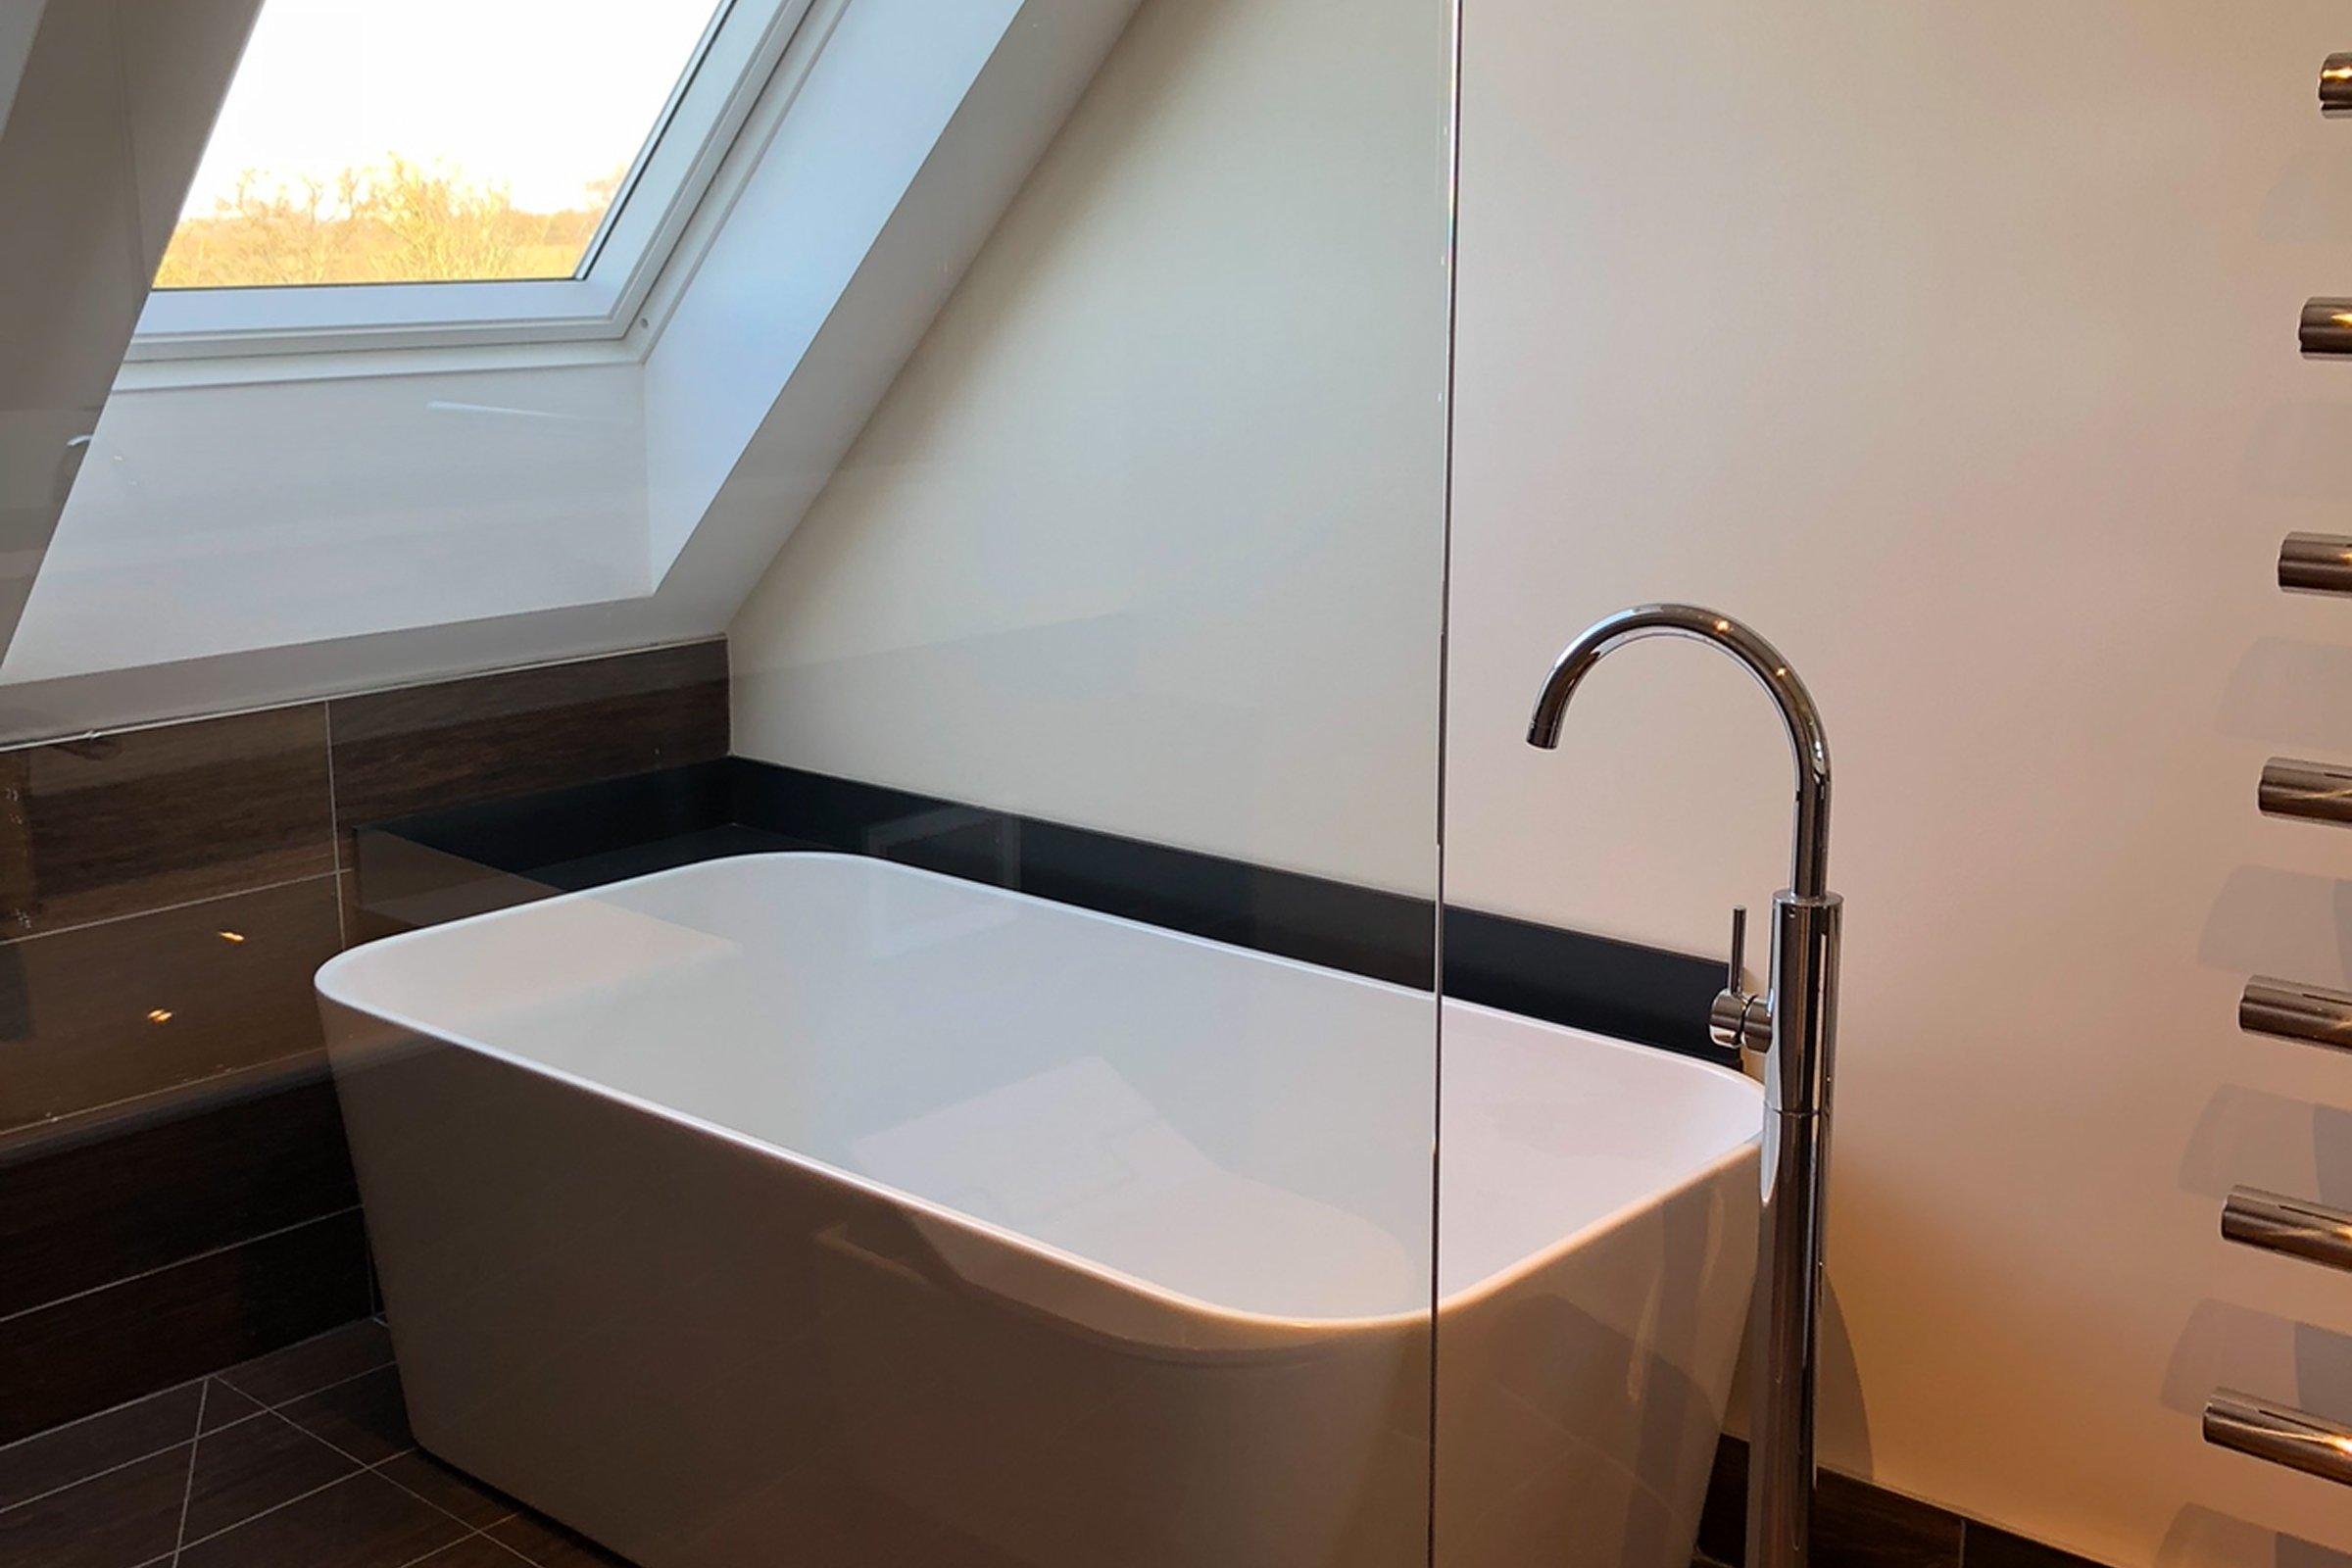 Bathroom with Savant audio